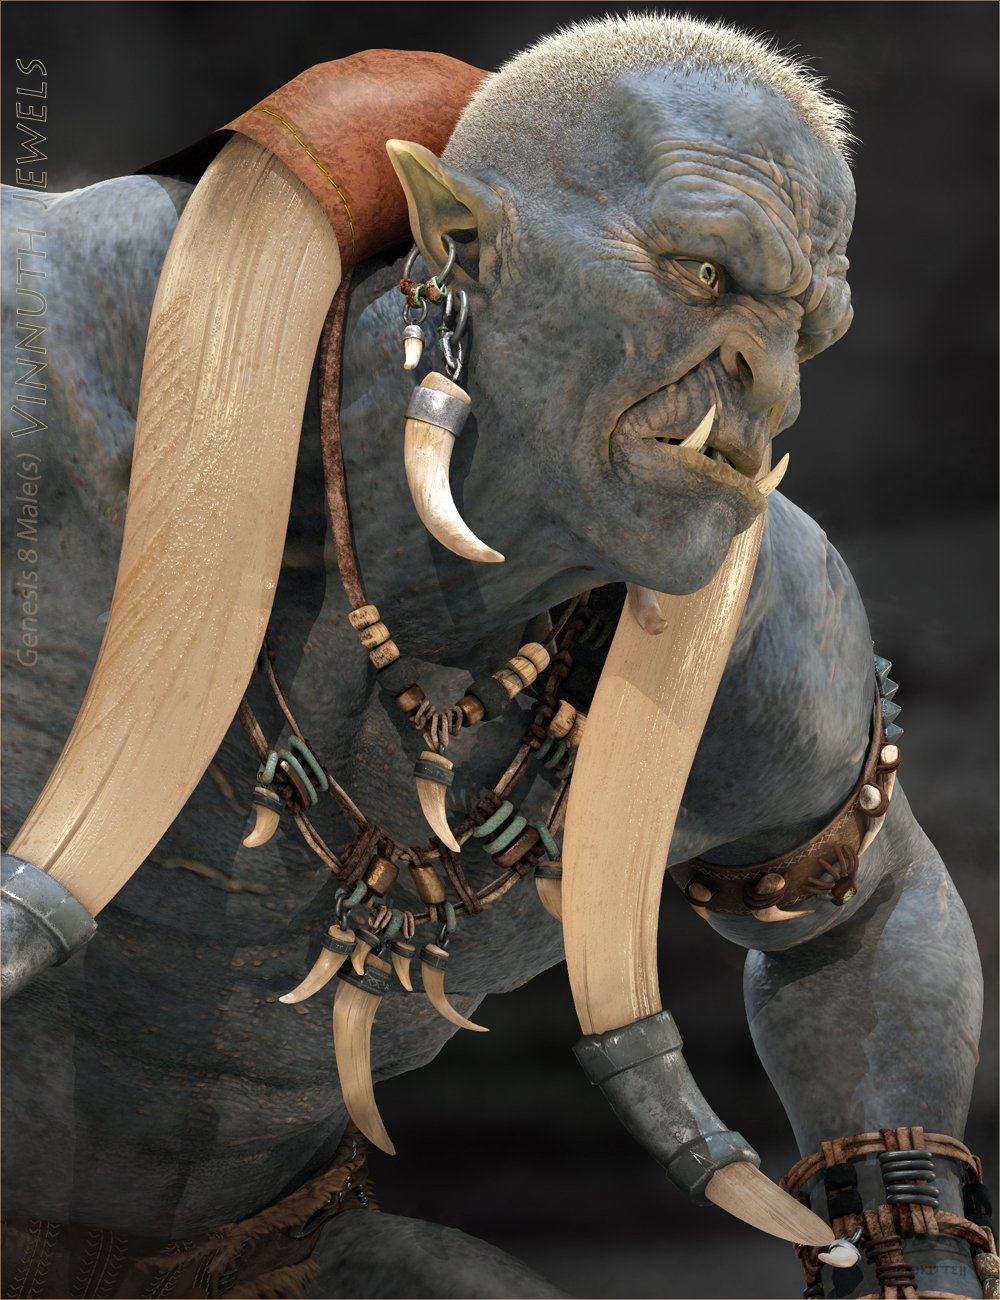 Vinnuth Kriegor Barbarian Jewels for Genesis 8 Male(s) by: BadKitteh Co, 3D Models by Daz 3D